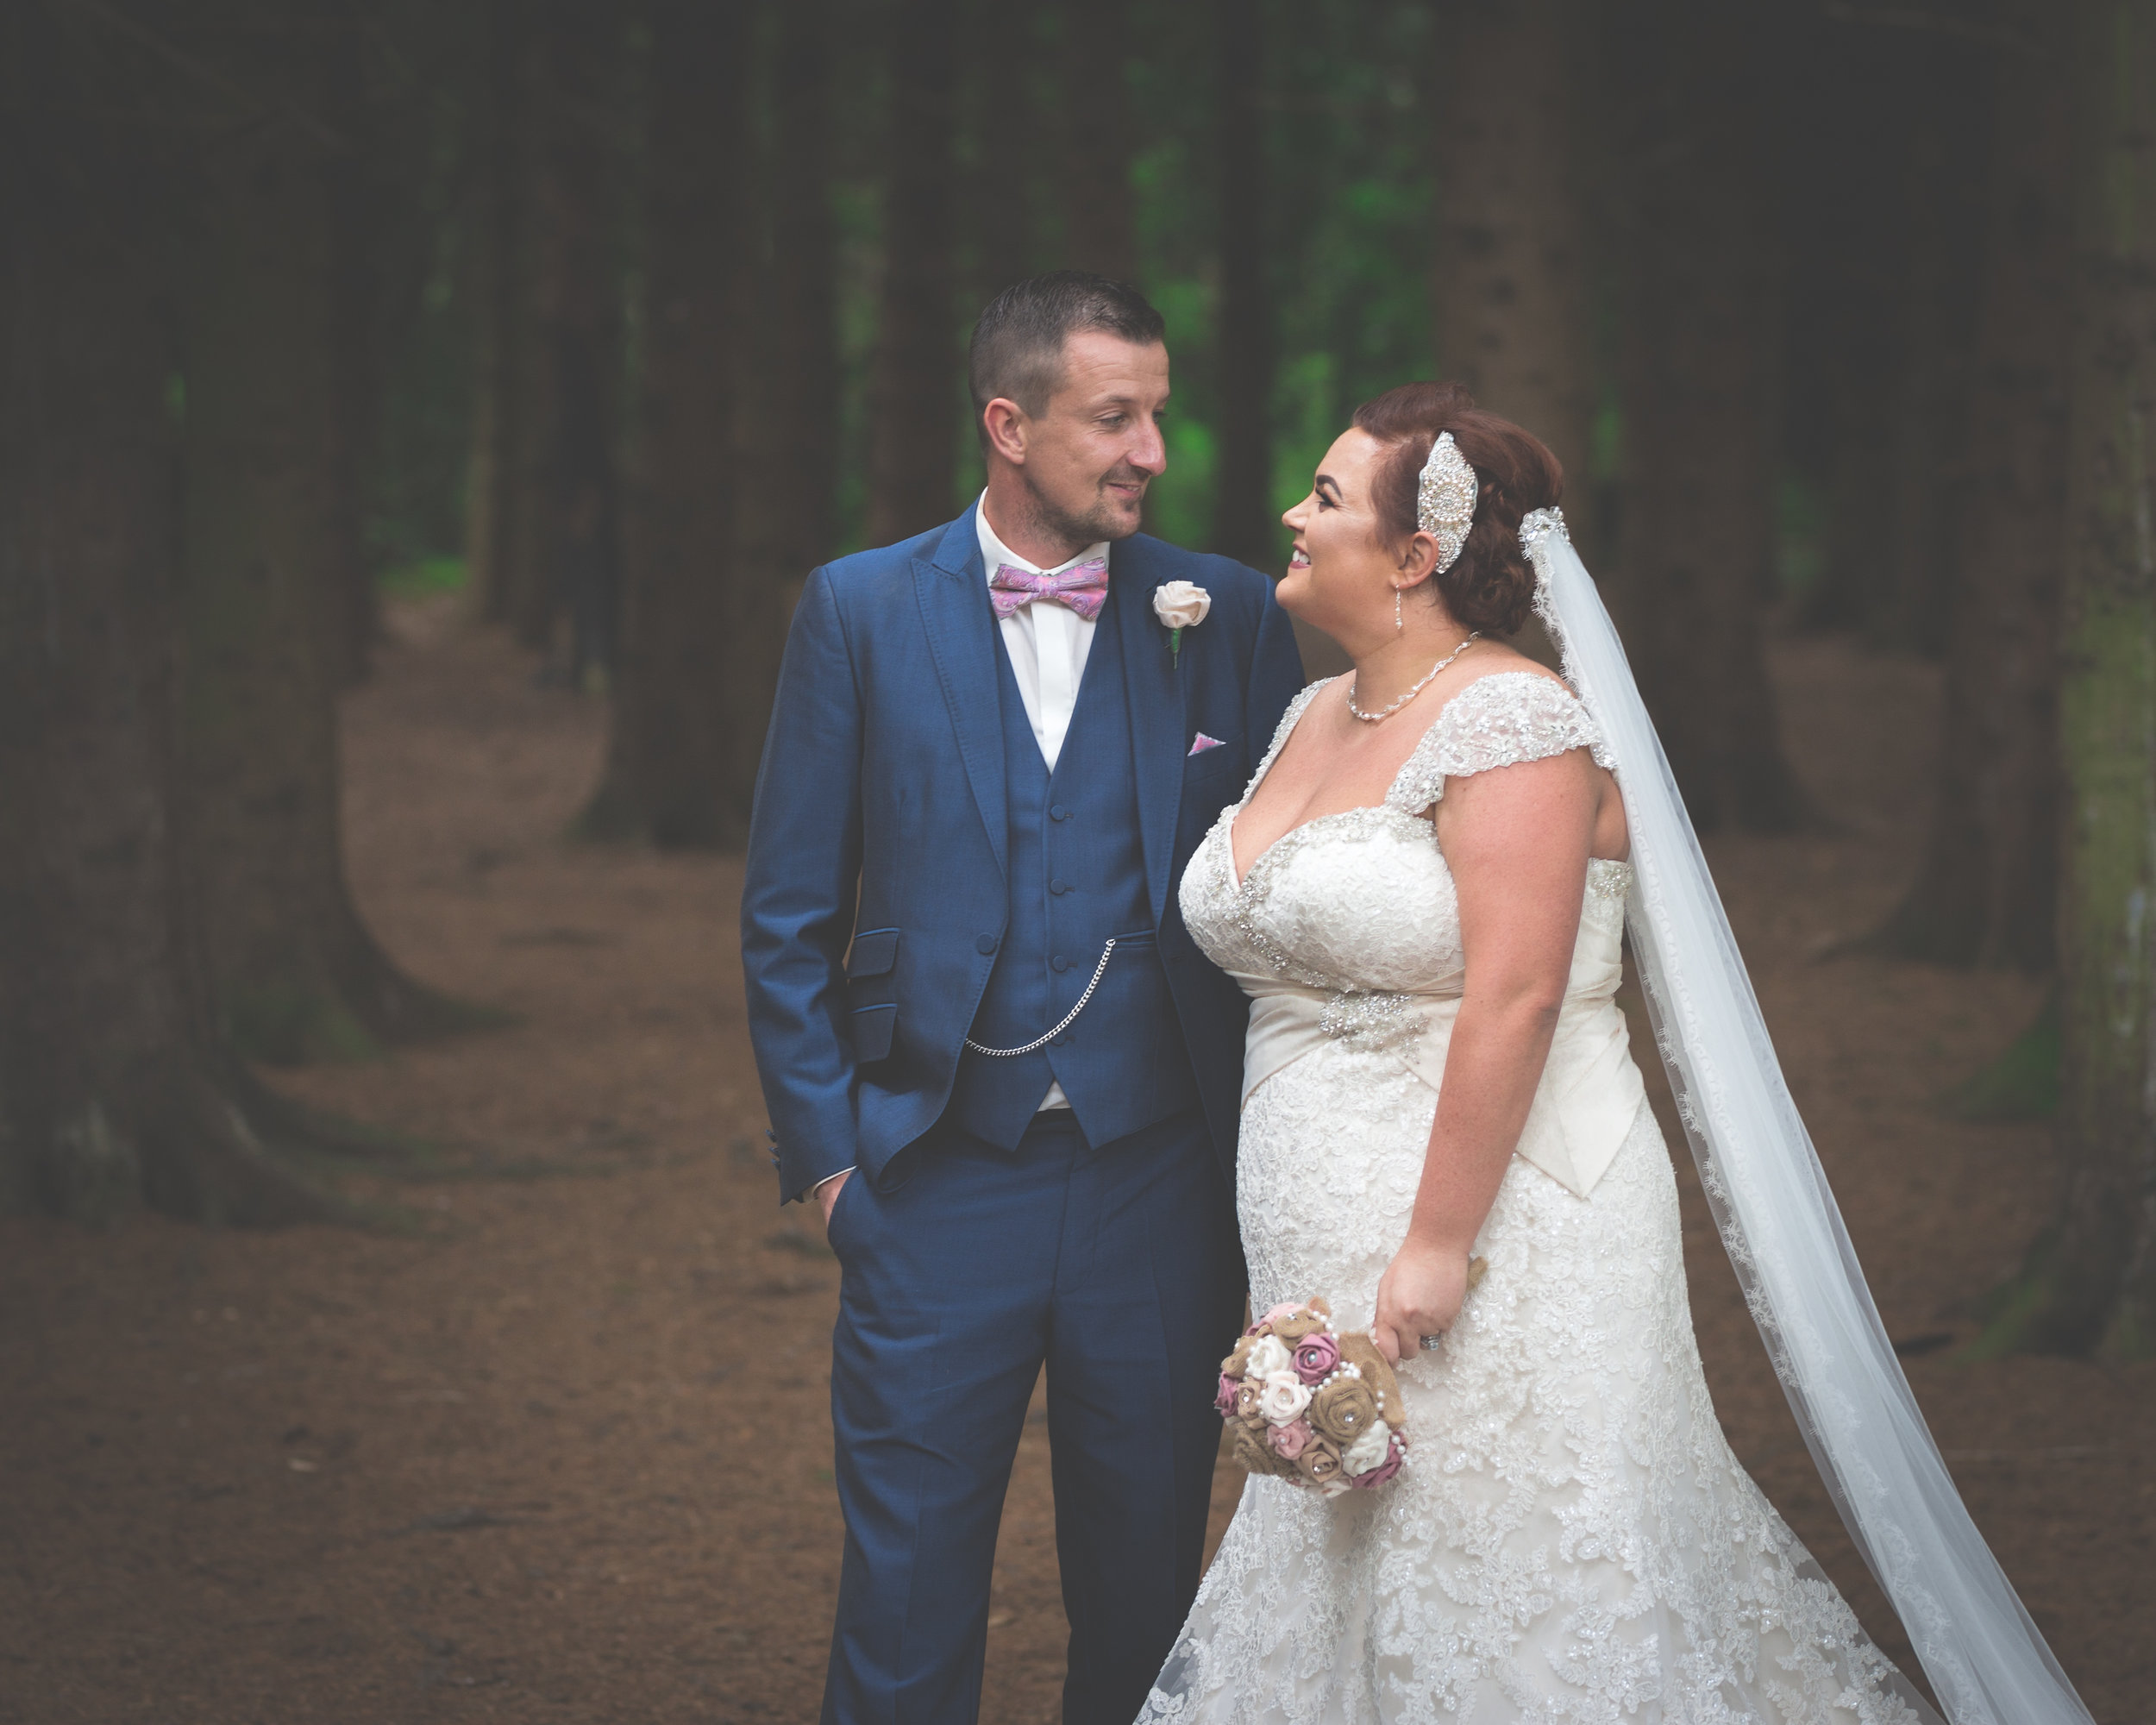 Antoinette & Stephen - Portraits   Brian McEwan Photography   Wedding Photographer Northern Ireland 26.jpg